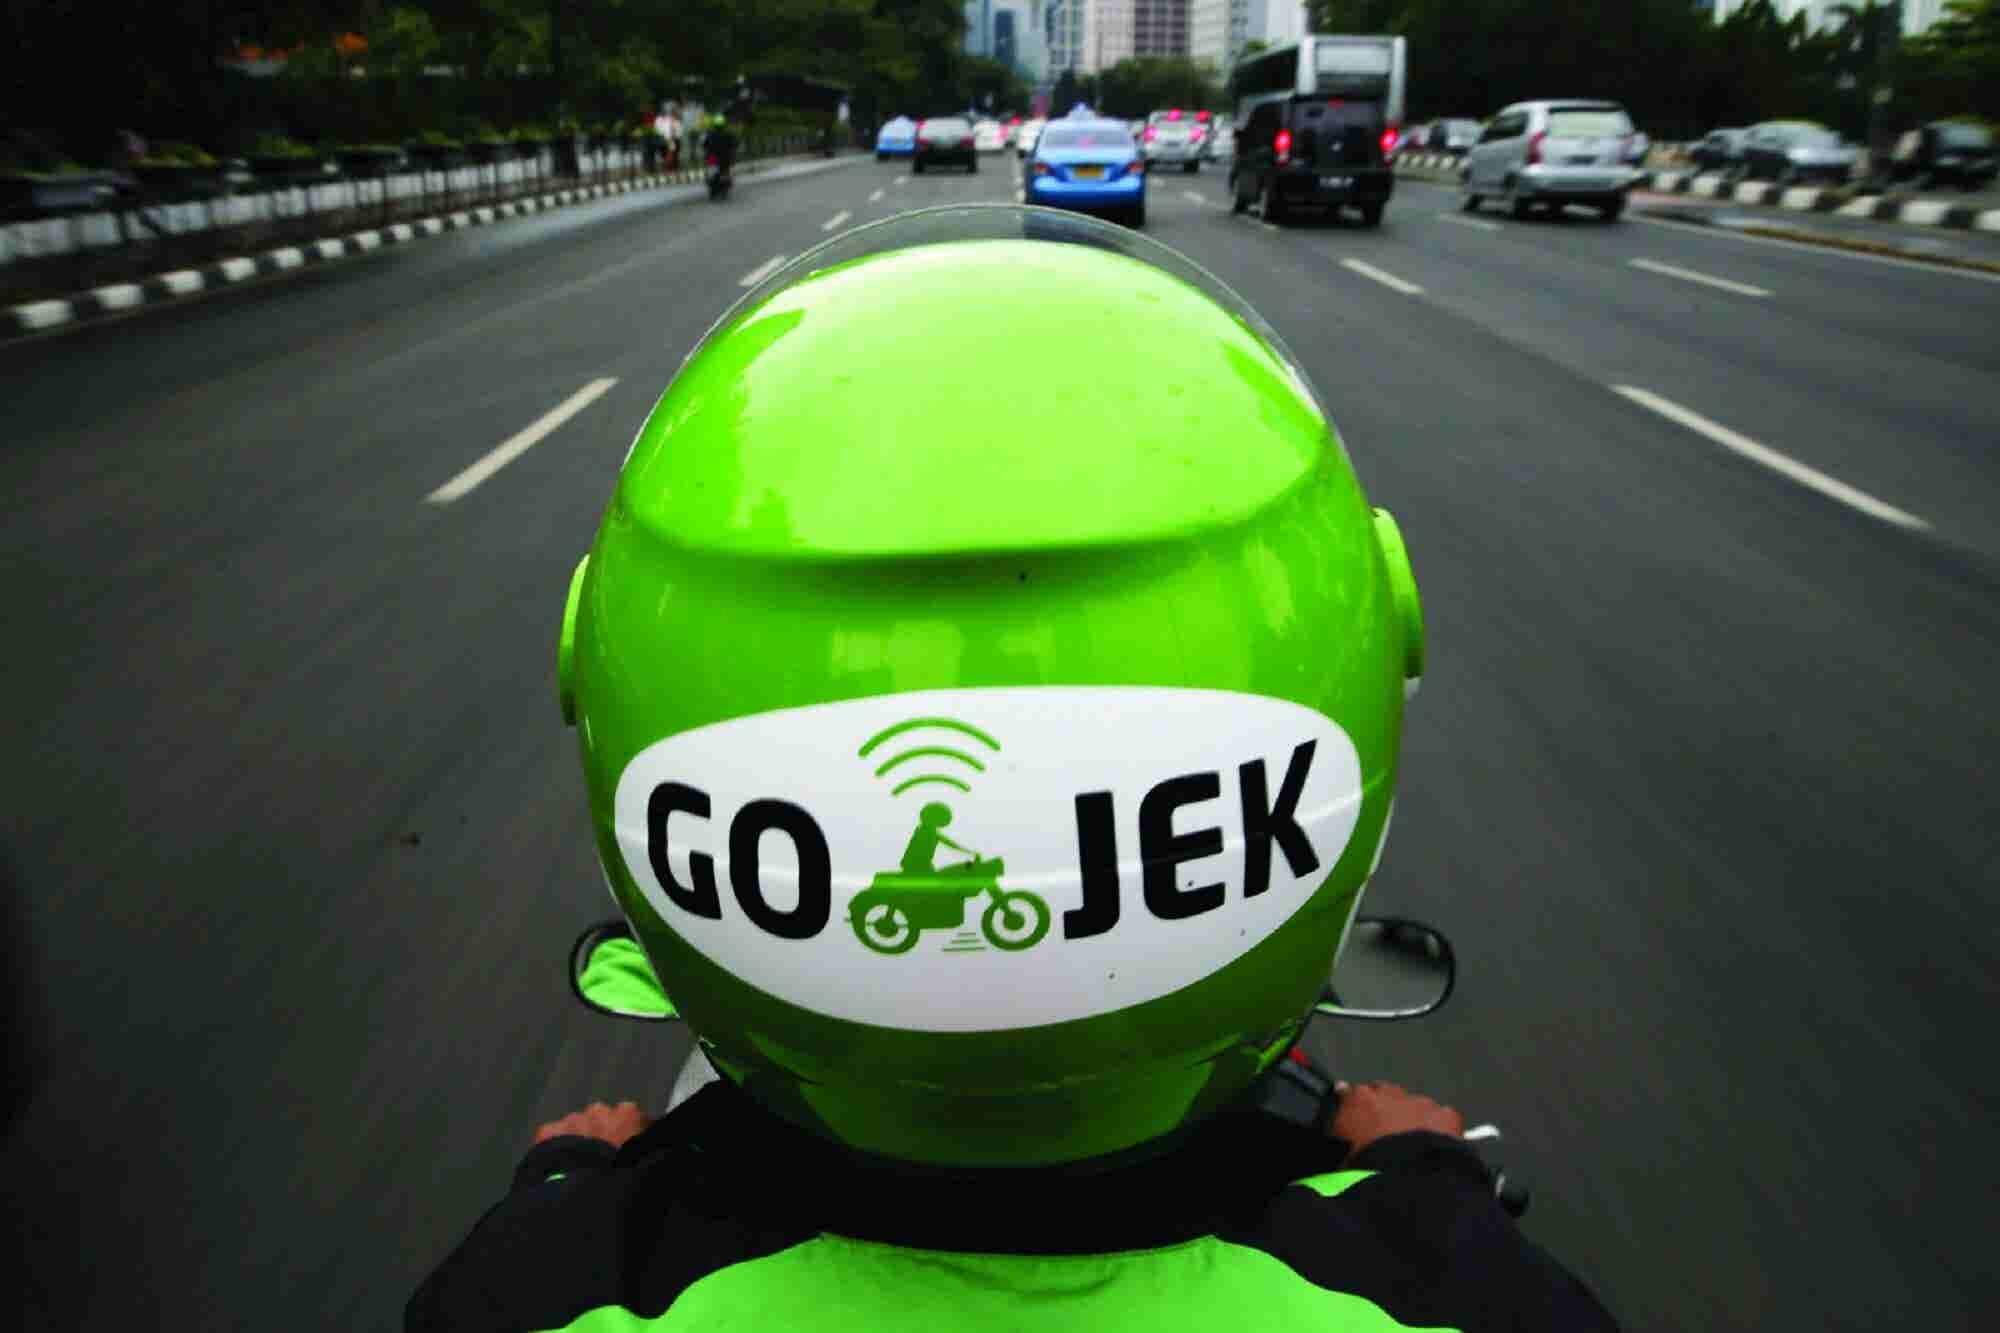 Indonesian Ride-hailing Giant Go-Jek Picks Up $100 Million Funding From Astra International